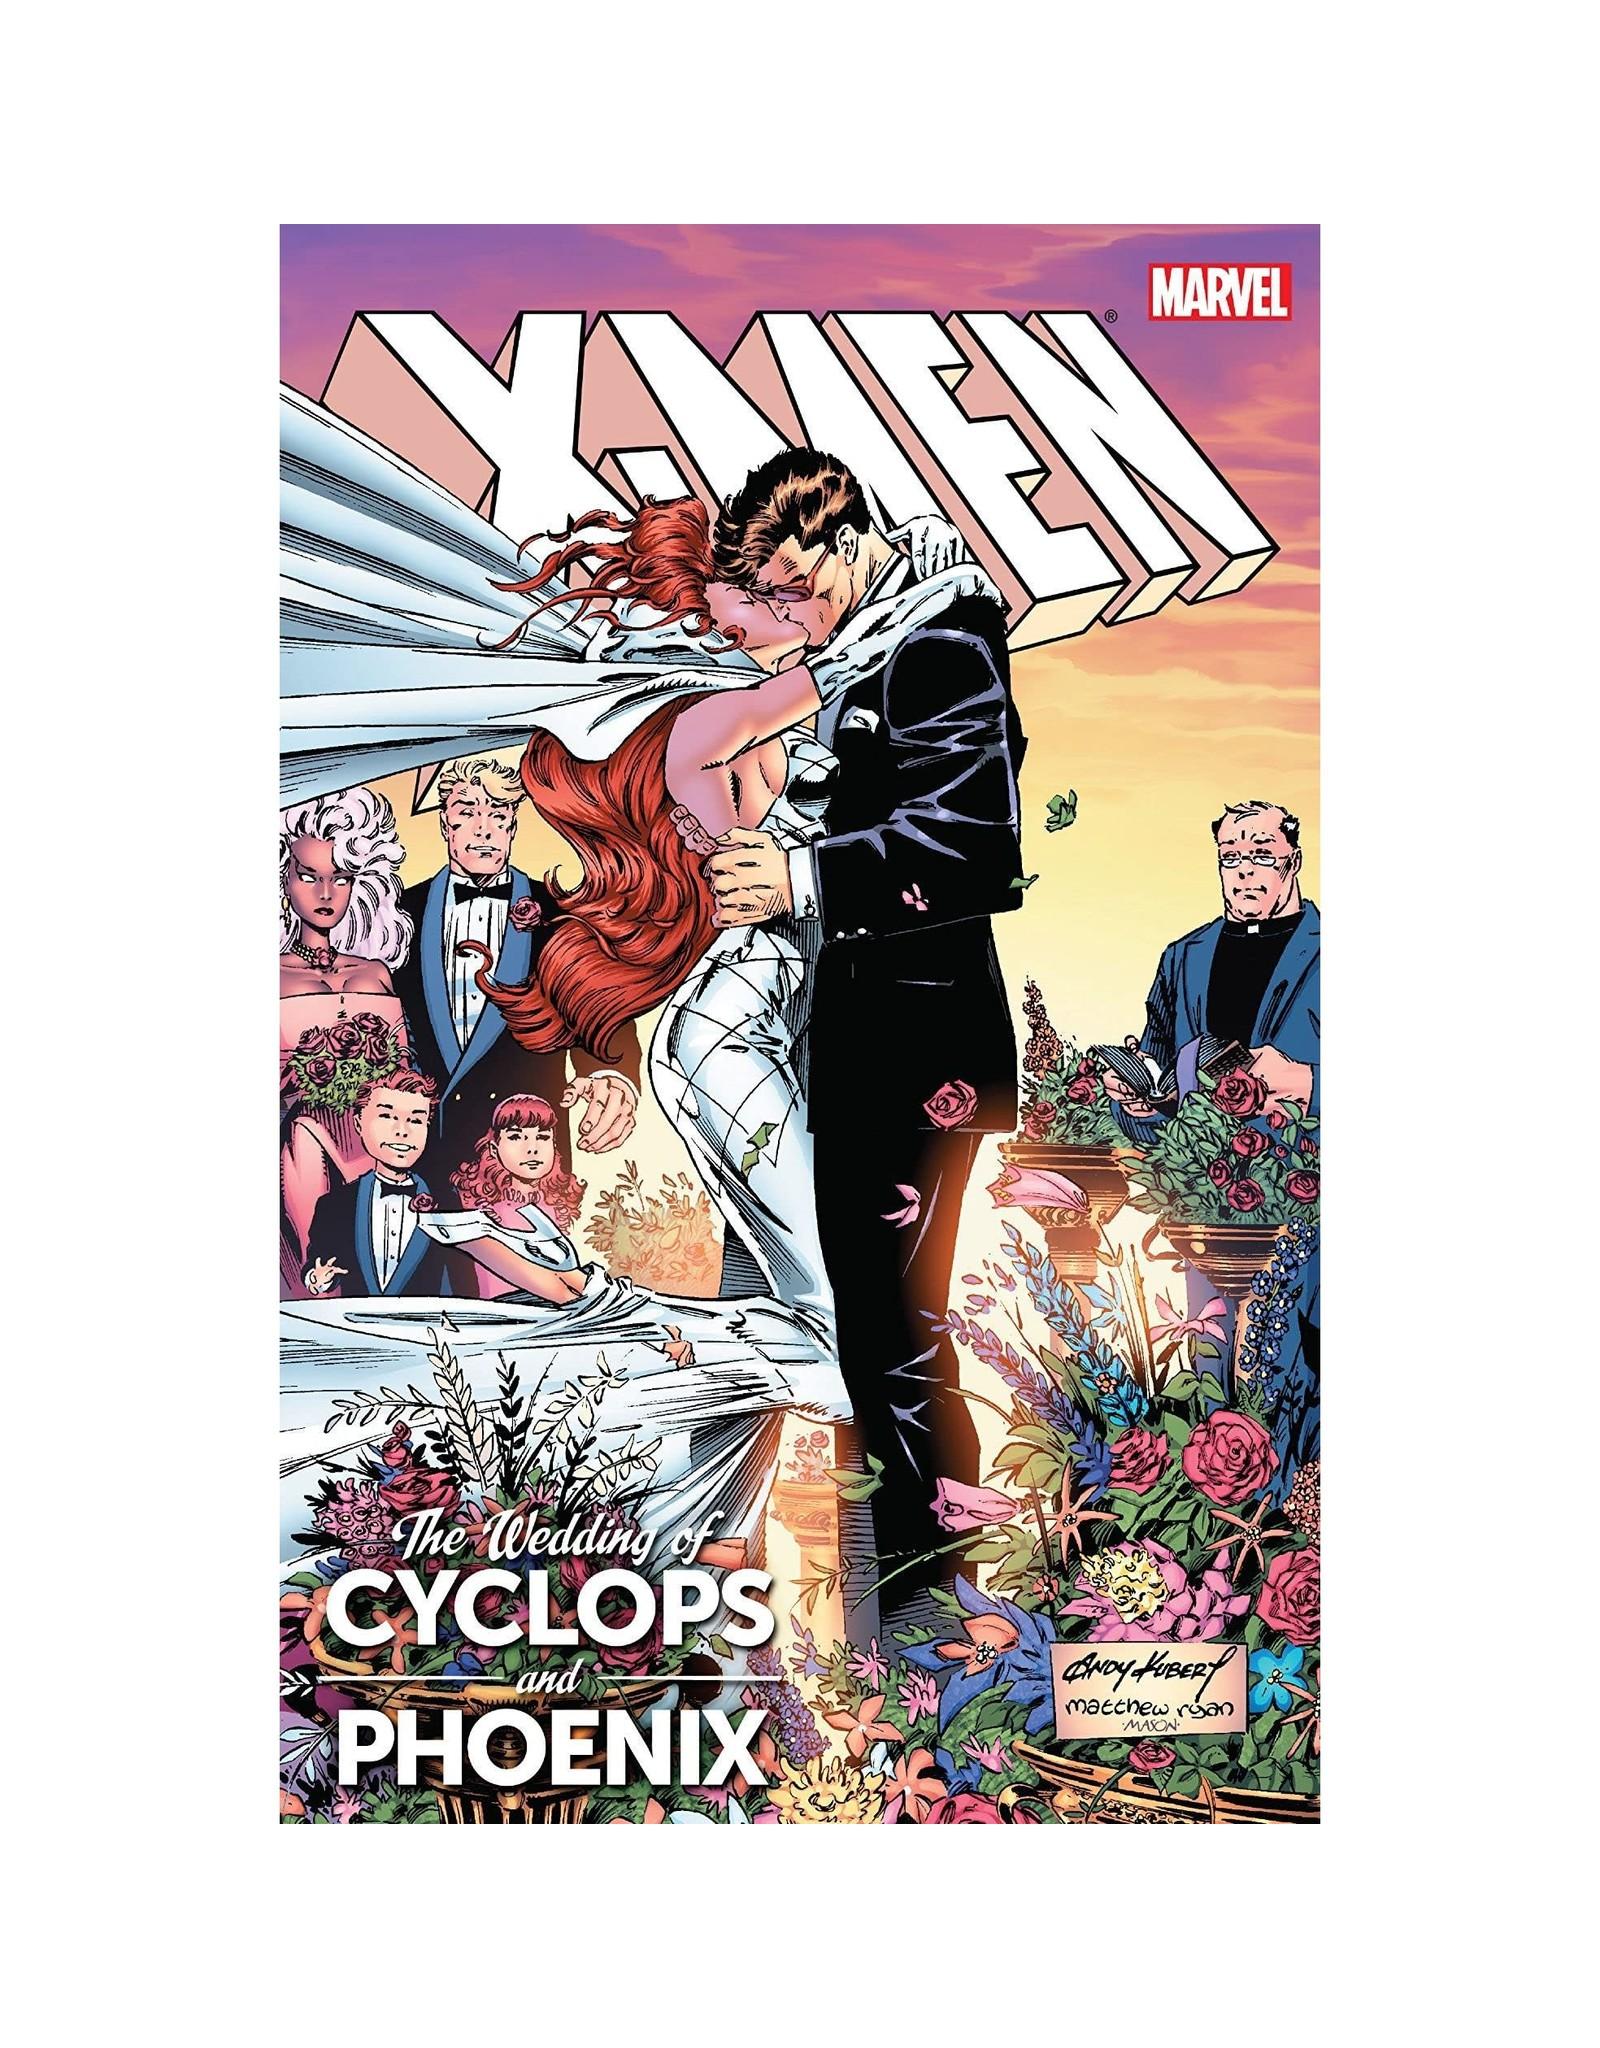 MARVEL COMICS X-MEN WEDDING OF CYCLOPS AND PHOENIX TP